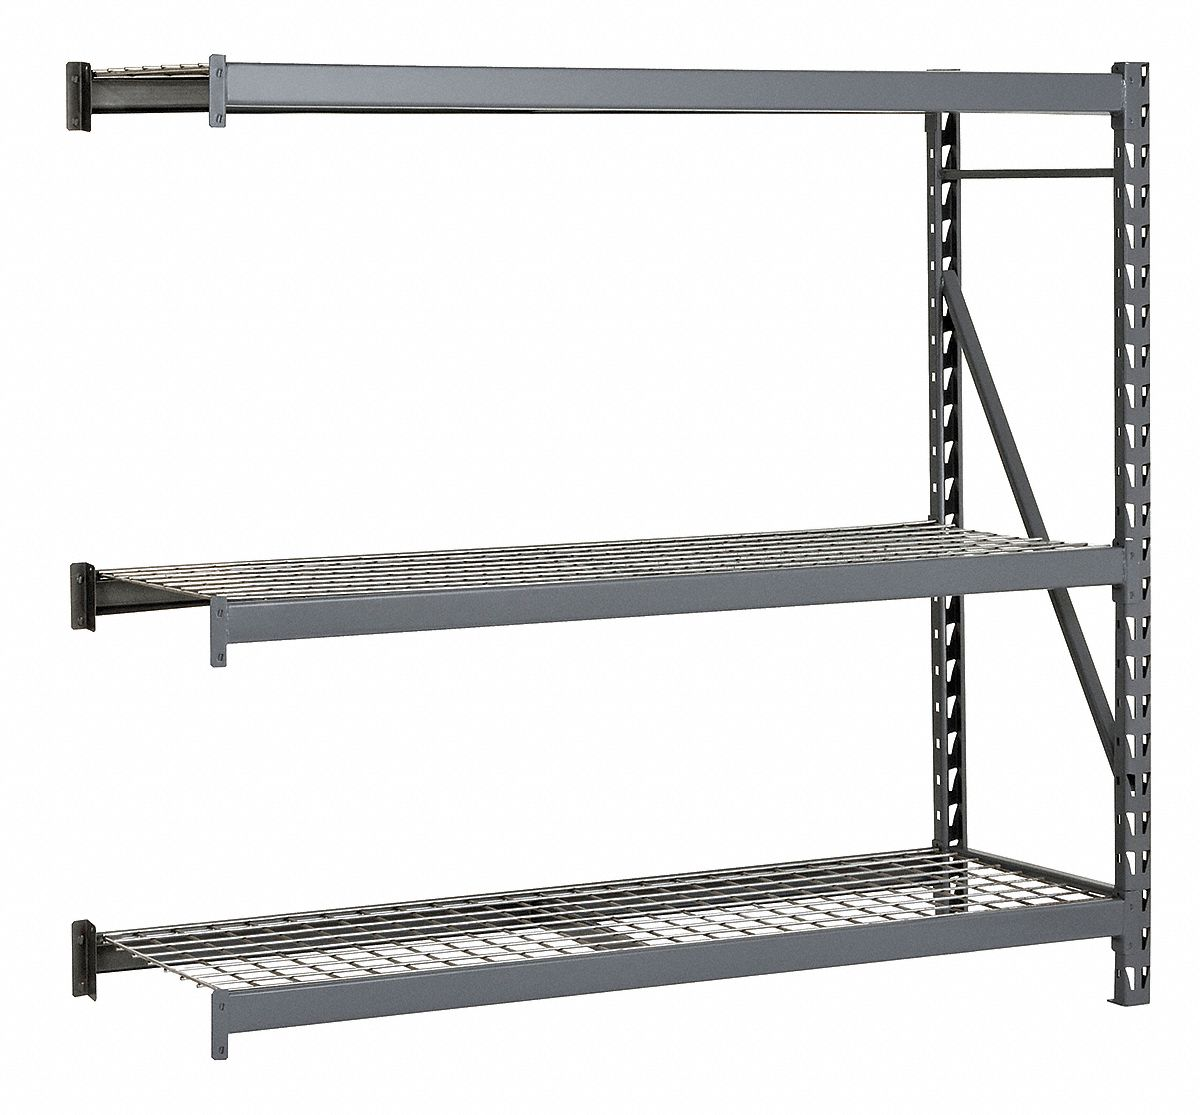 Bulk Storage Rack Add On W 60 D 36 H 96